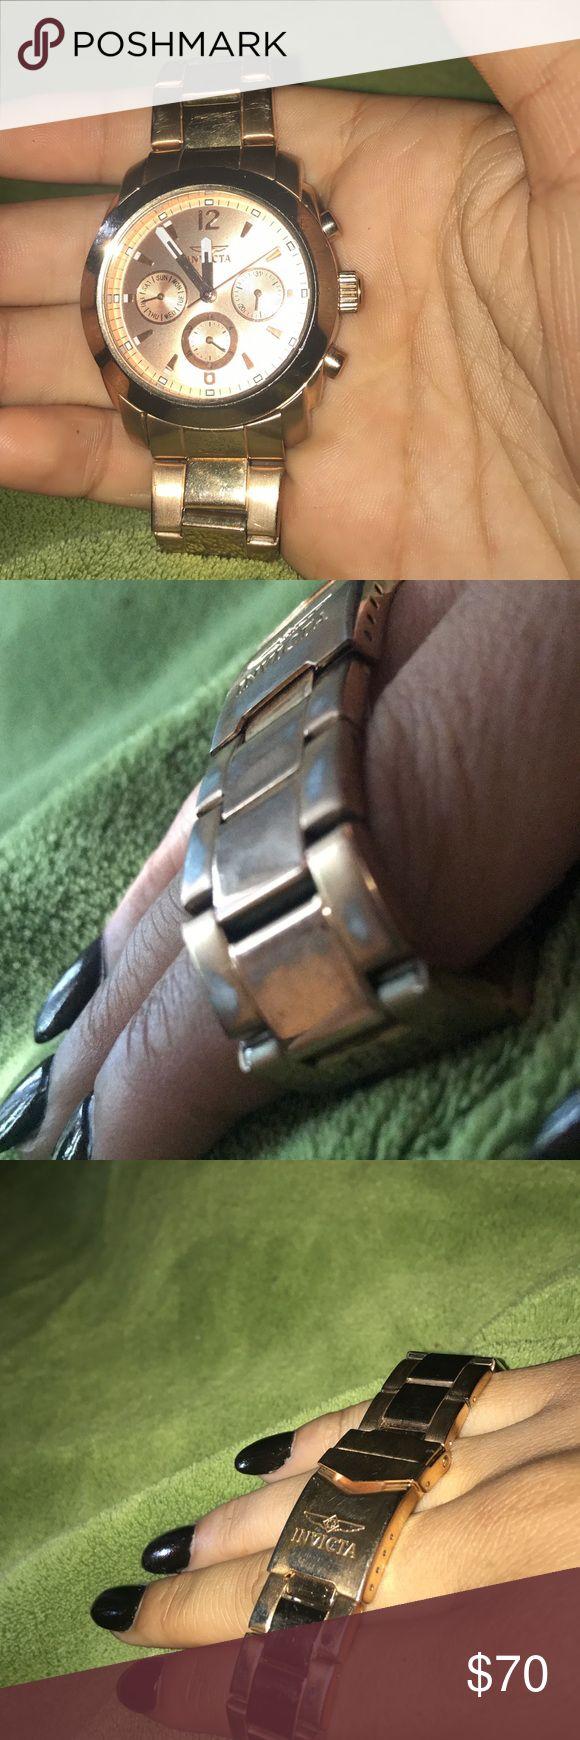 Invicta Women's Watch Needs a new battery, has slight scuffs Invicta Jewelry Bracelets